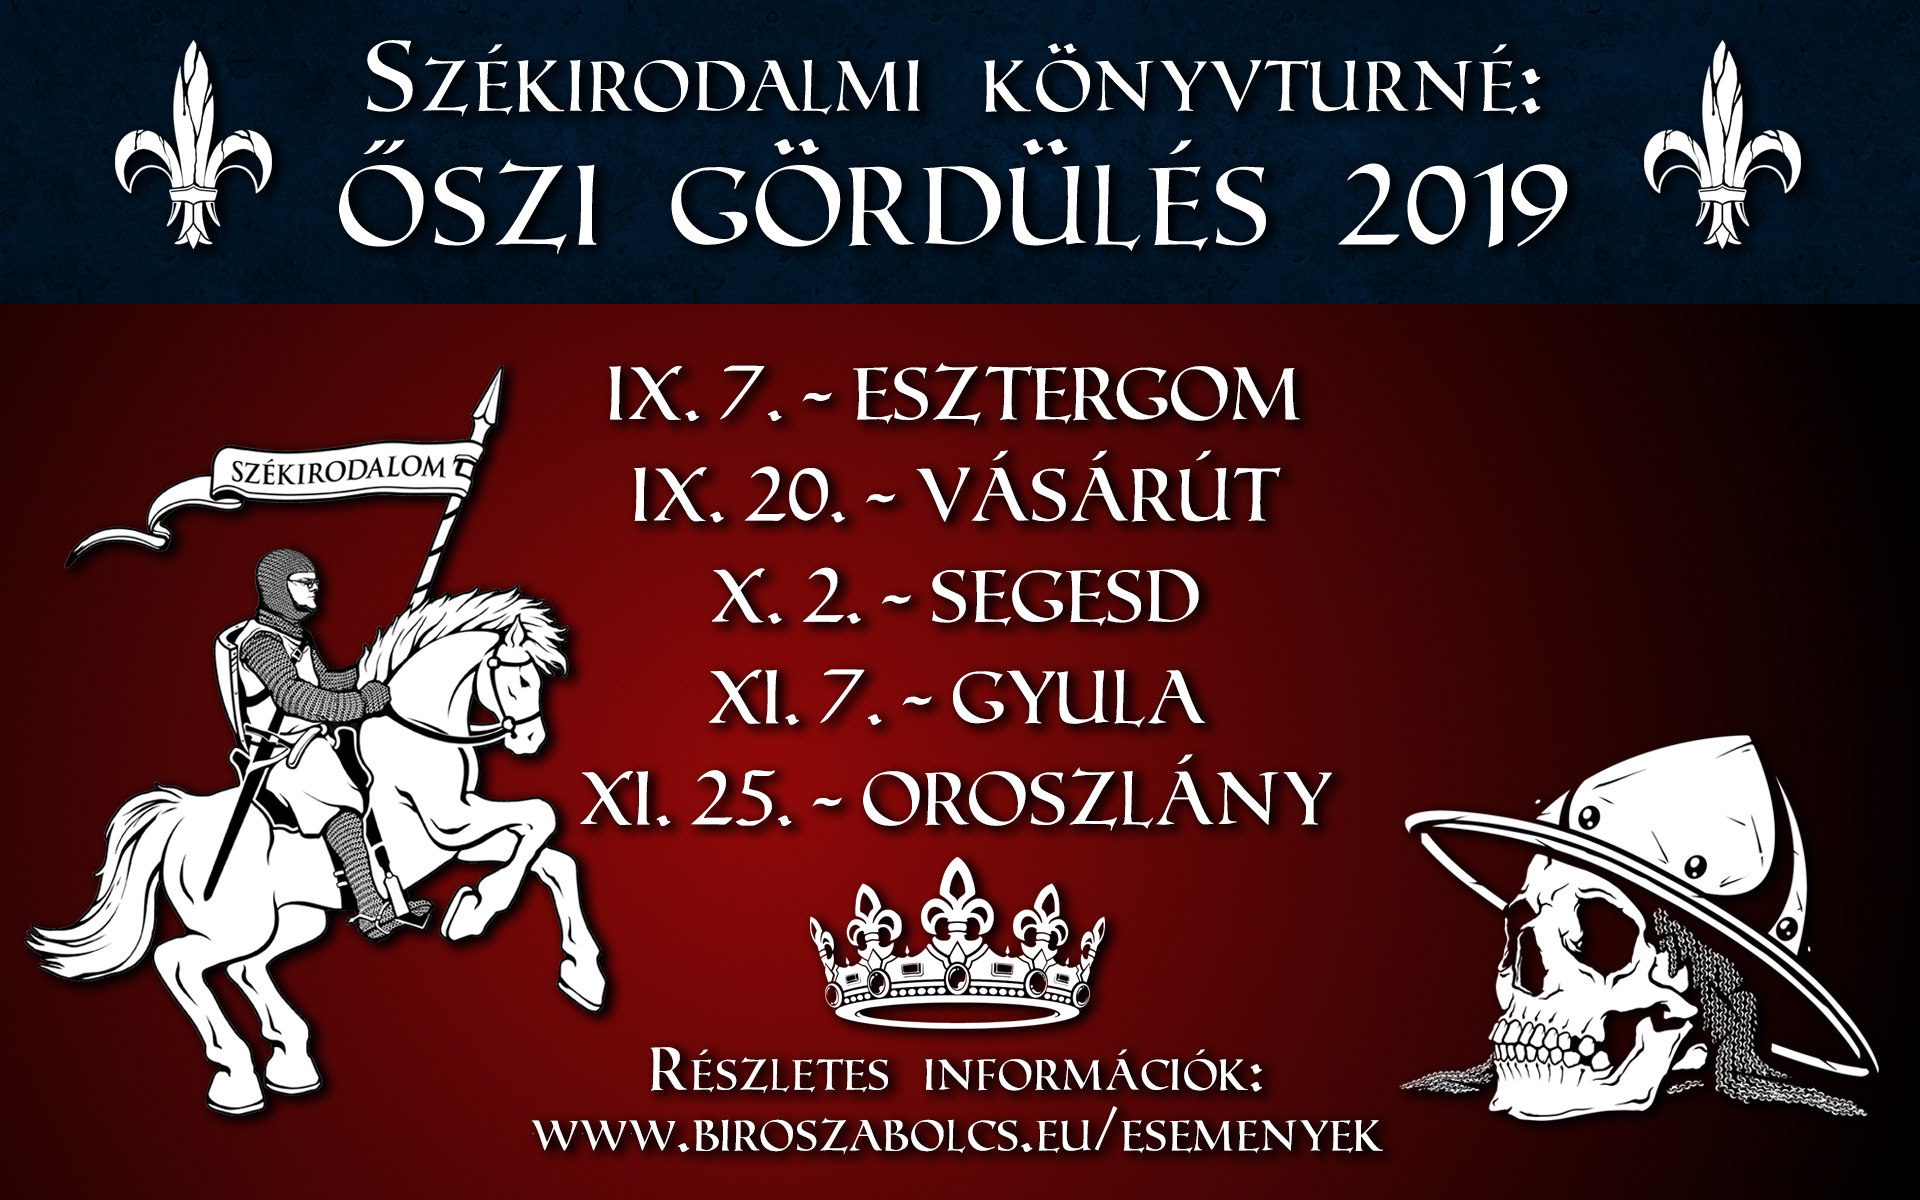 oszi_gordules_2019.jpg